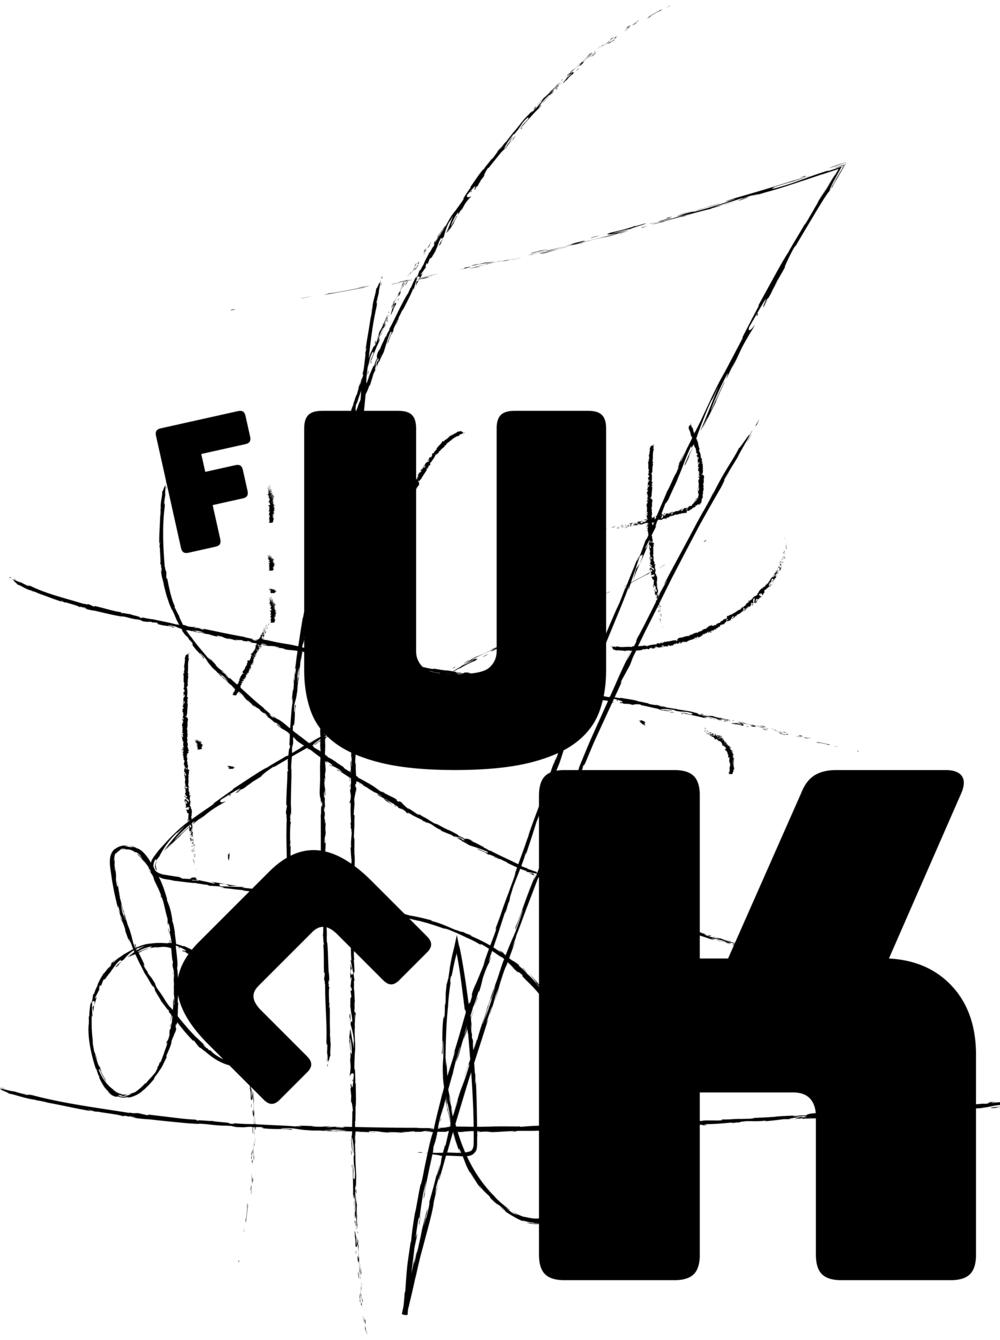 fuck fuck fuck fuck fuck fuck fuck fuck fuck fuck fuck fuck fuck fuck fuck fuck fuck fuck fuck fuck fuck fuck fuck fuck fuck fuck fuck fuck fuck fuck fuck fuck fuck fuck fuck fuck fuck fuck fuck fuck fuck fuck fuck fuck - you